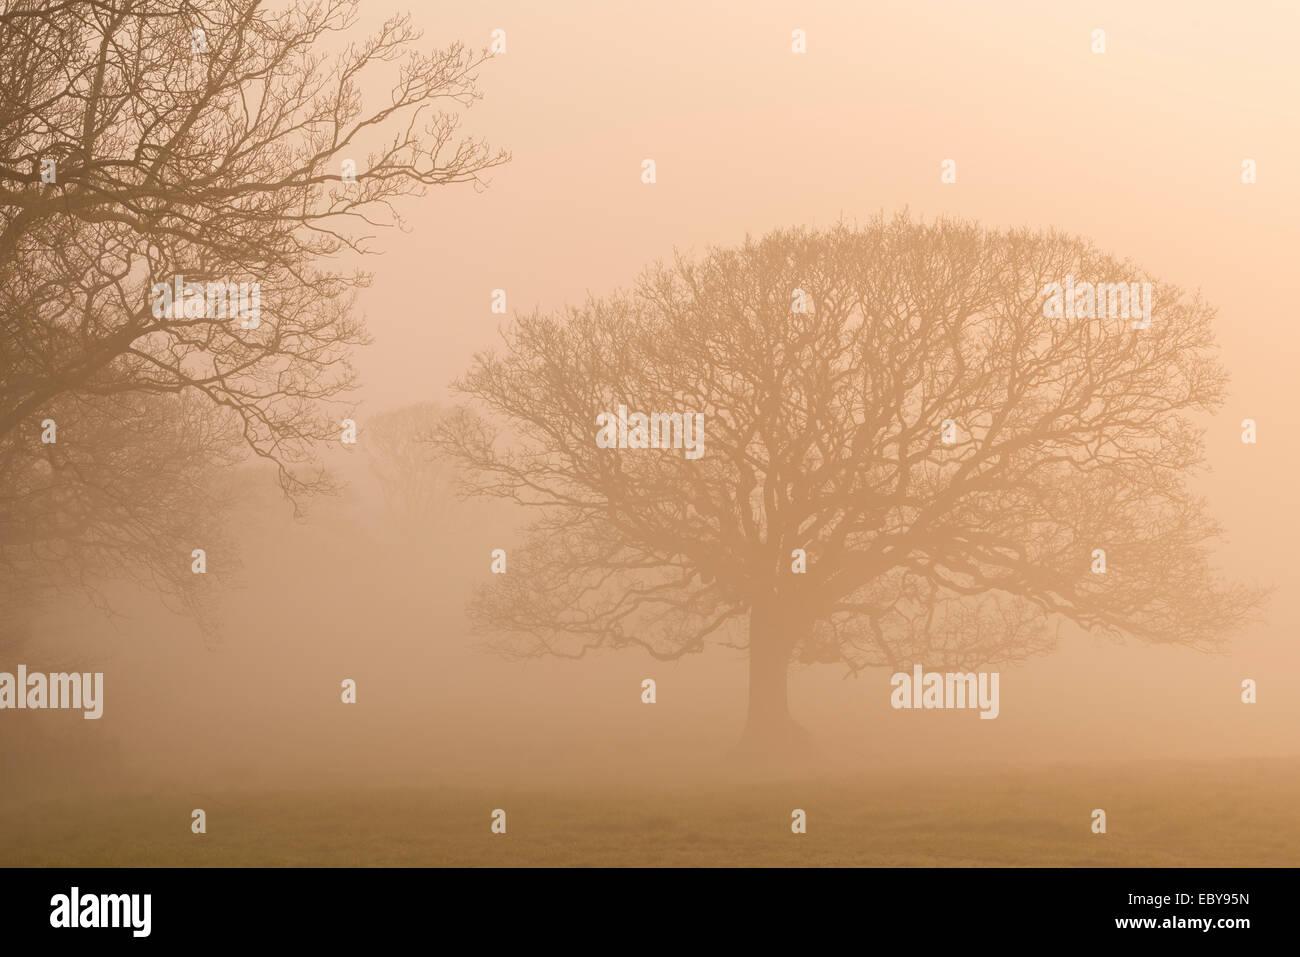 Arbres en hiver brouillard au lever du soleil, Black Dog, Devon, Angleterre. L'hiver (mars) 2014. Photo Stock